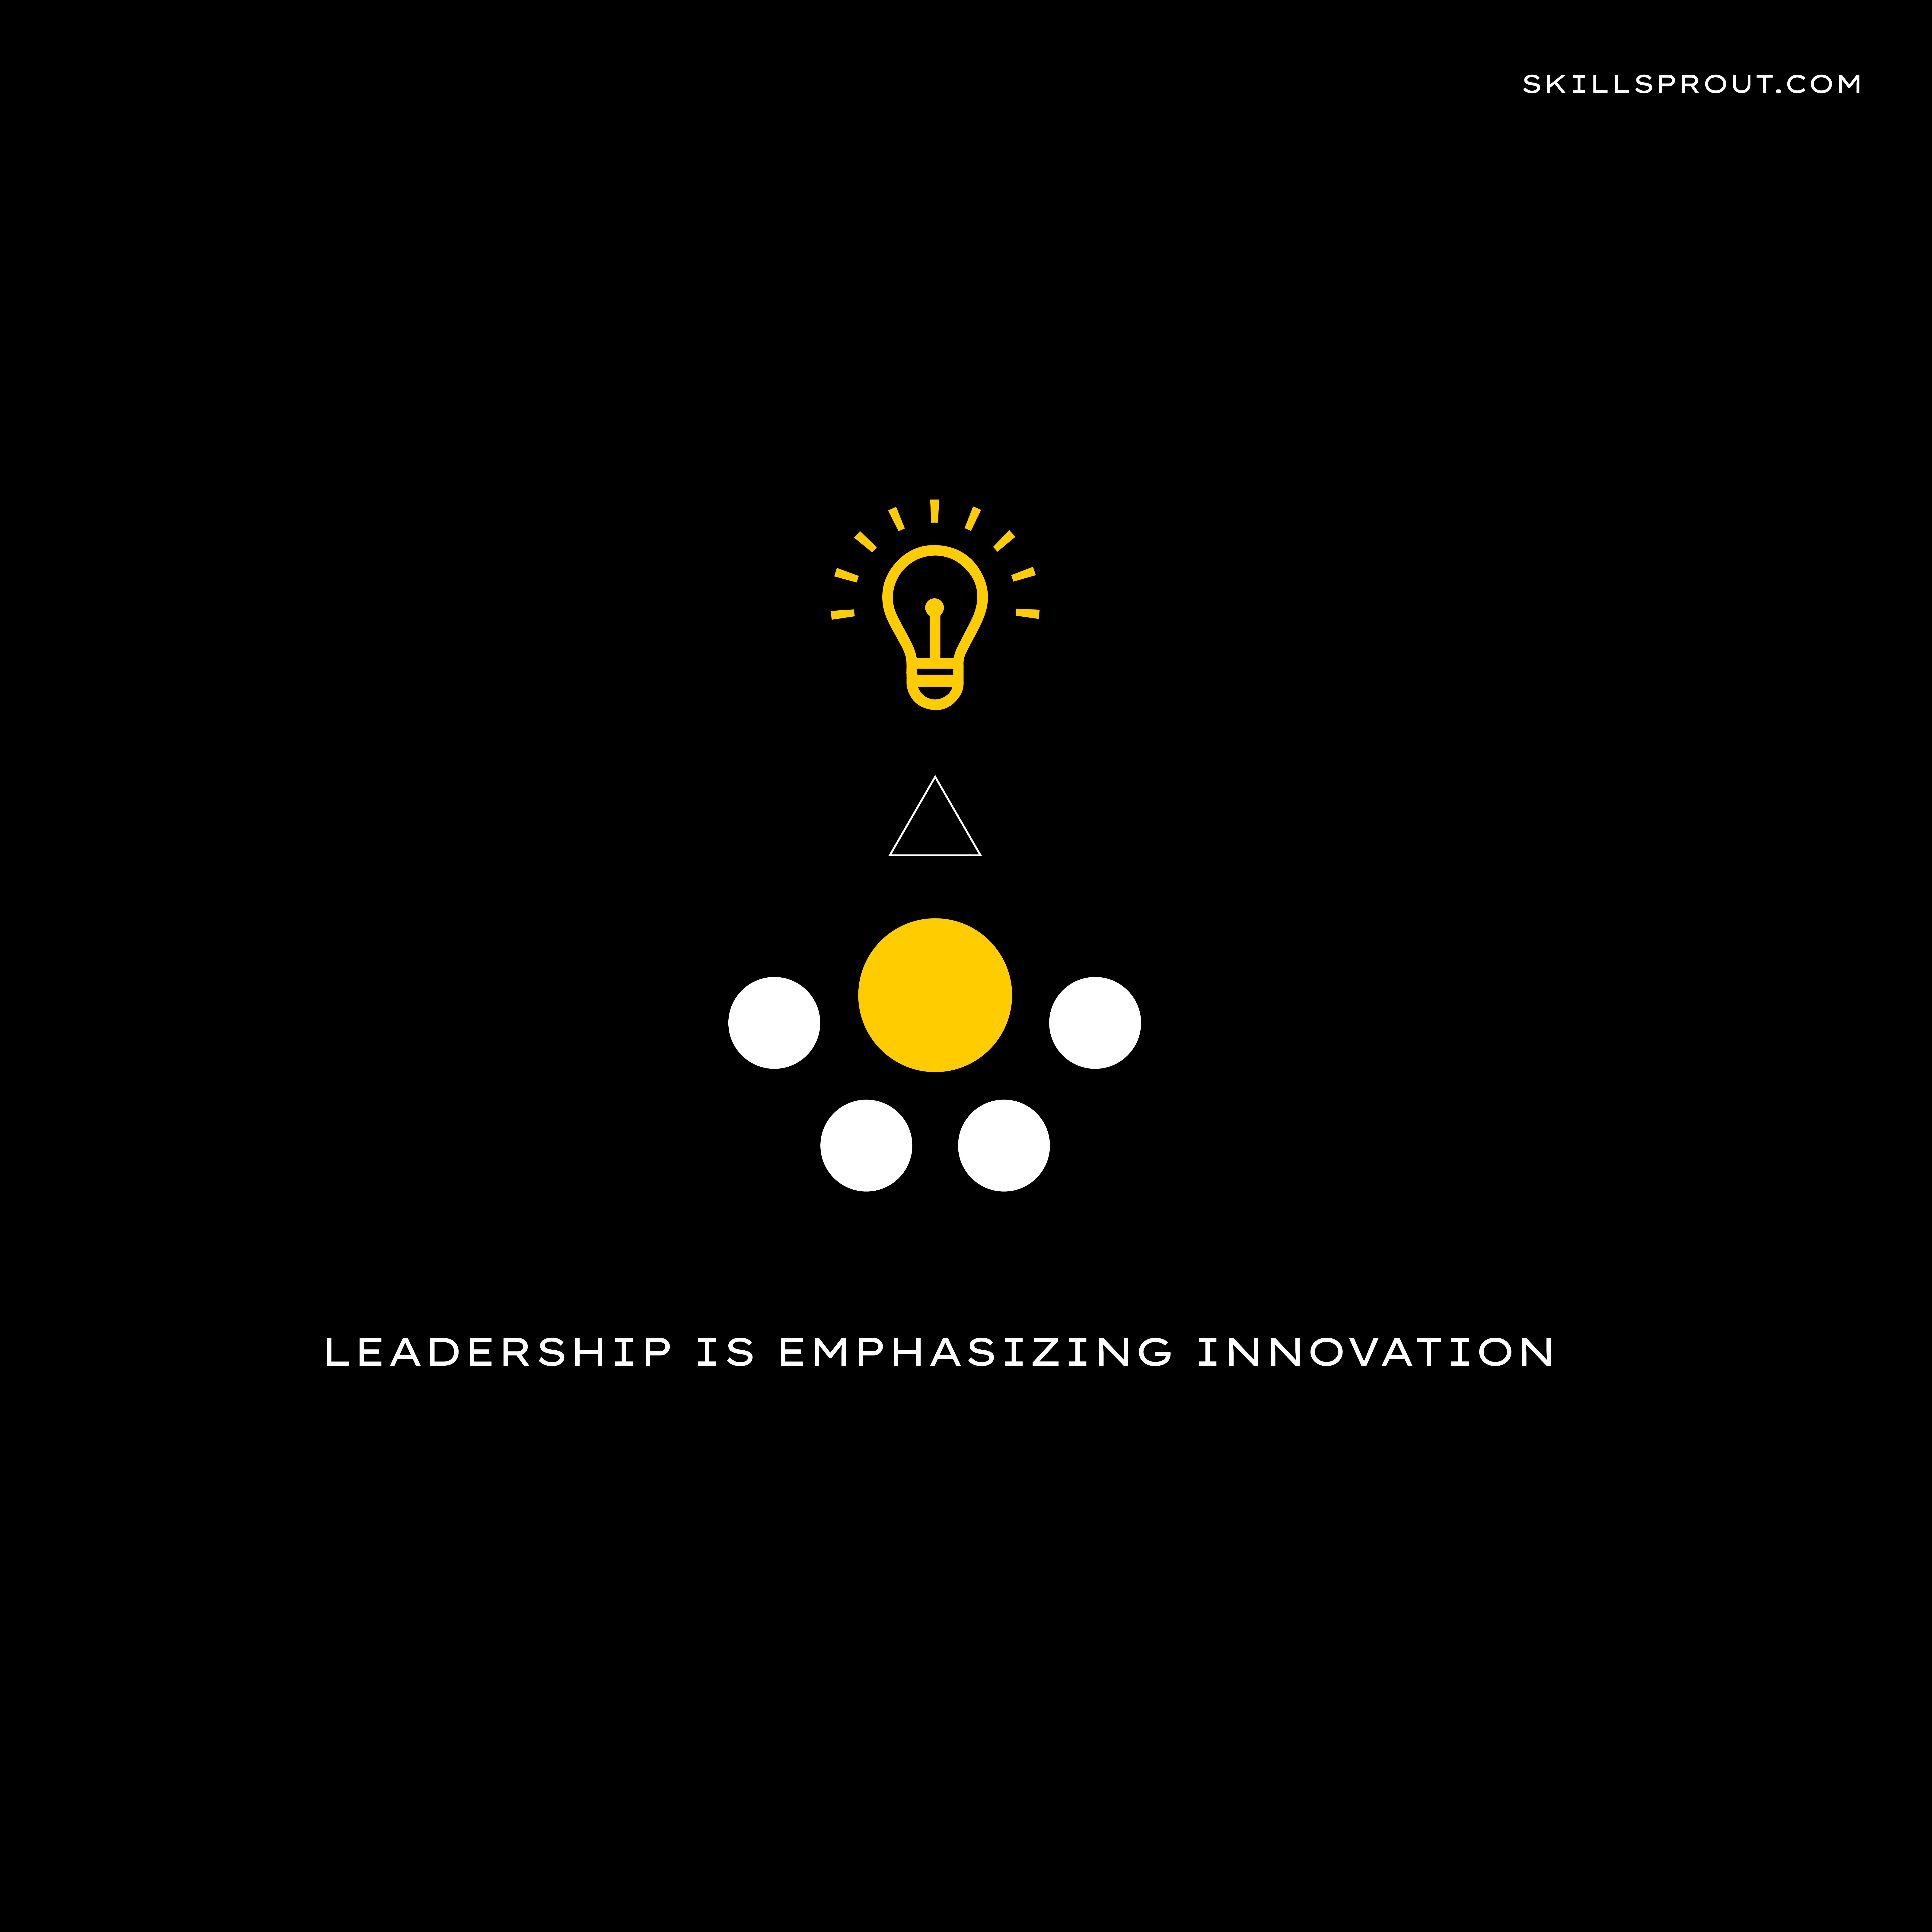 Leadership is emphasizing innovation.